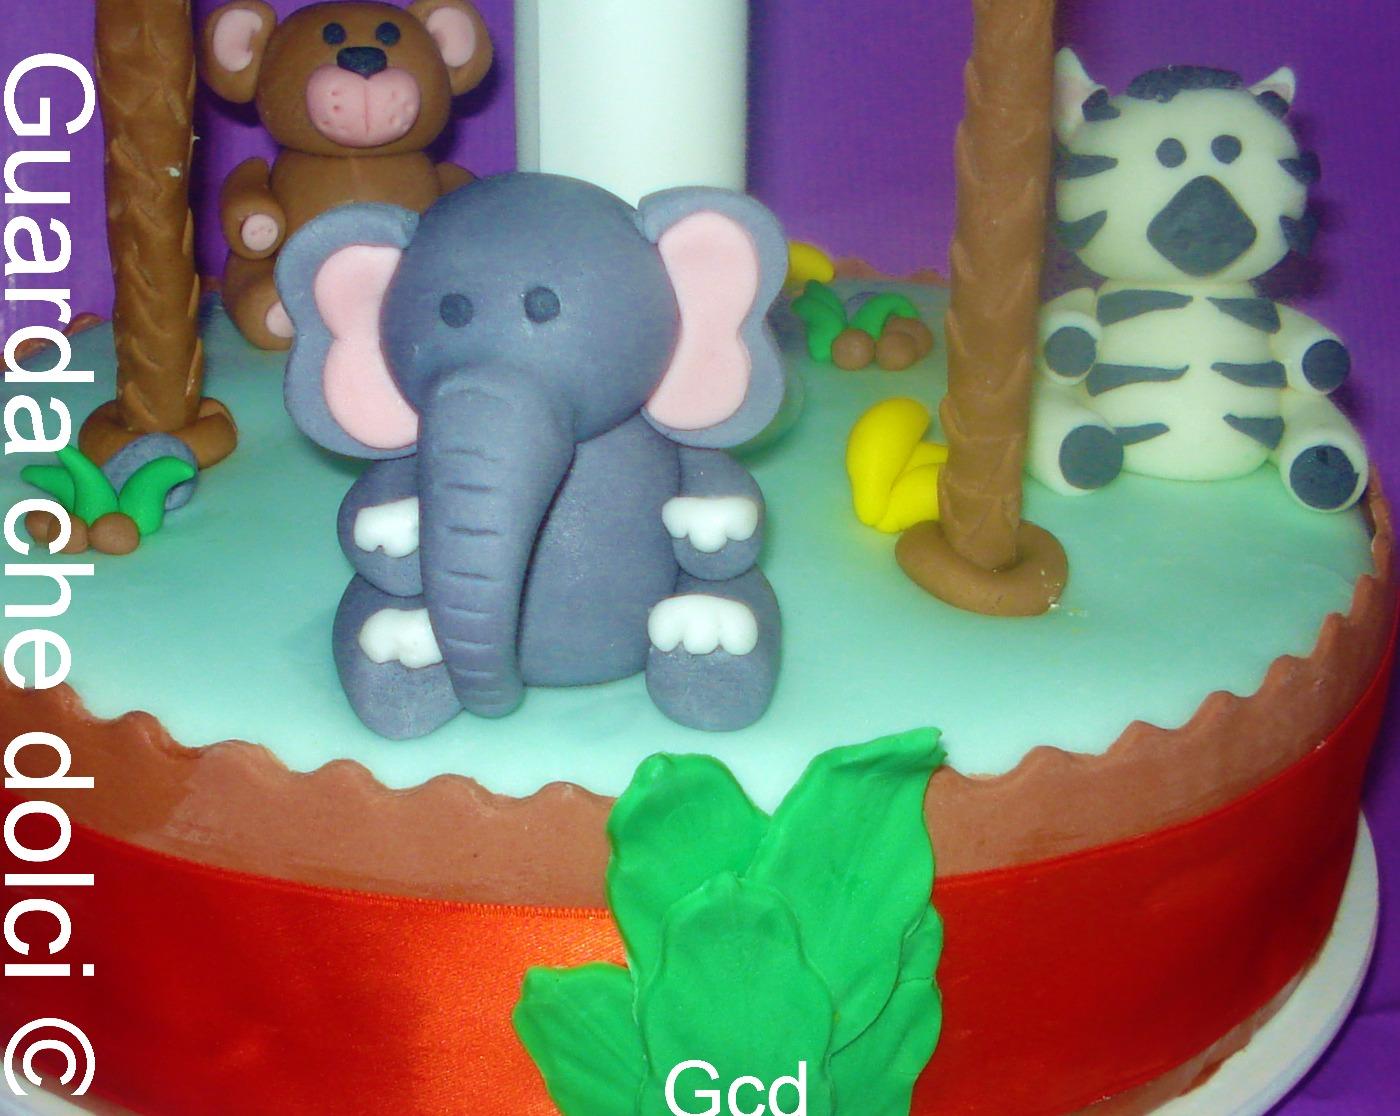 Cake Decorating Workshops Mansfield Uk